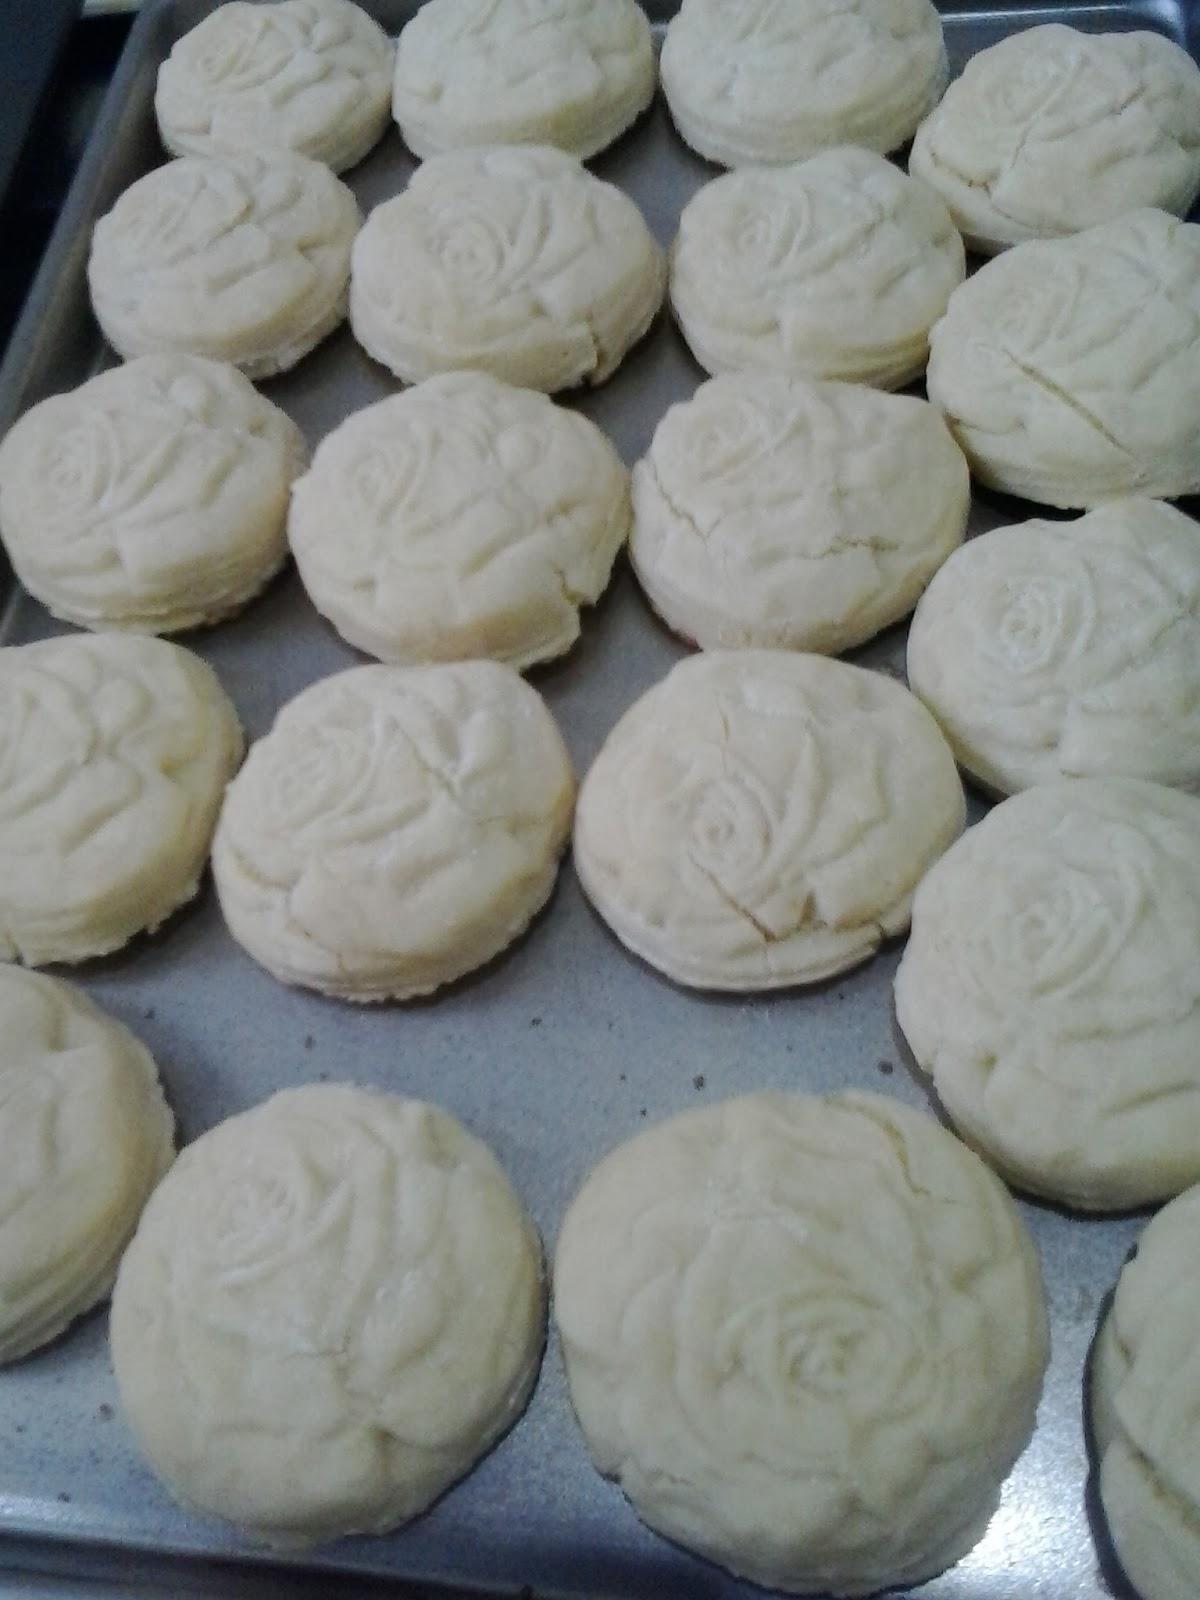 Mi maravilloso rinc n de reposter a creativa galletas - Ingredientes reposteria creativa ...